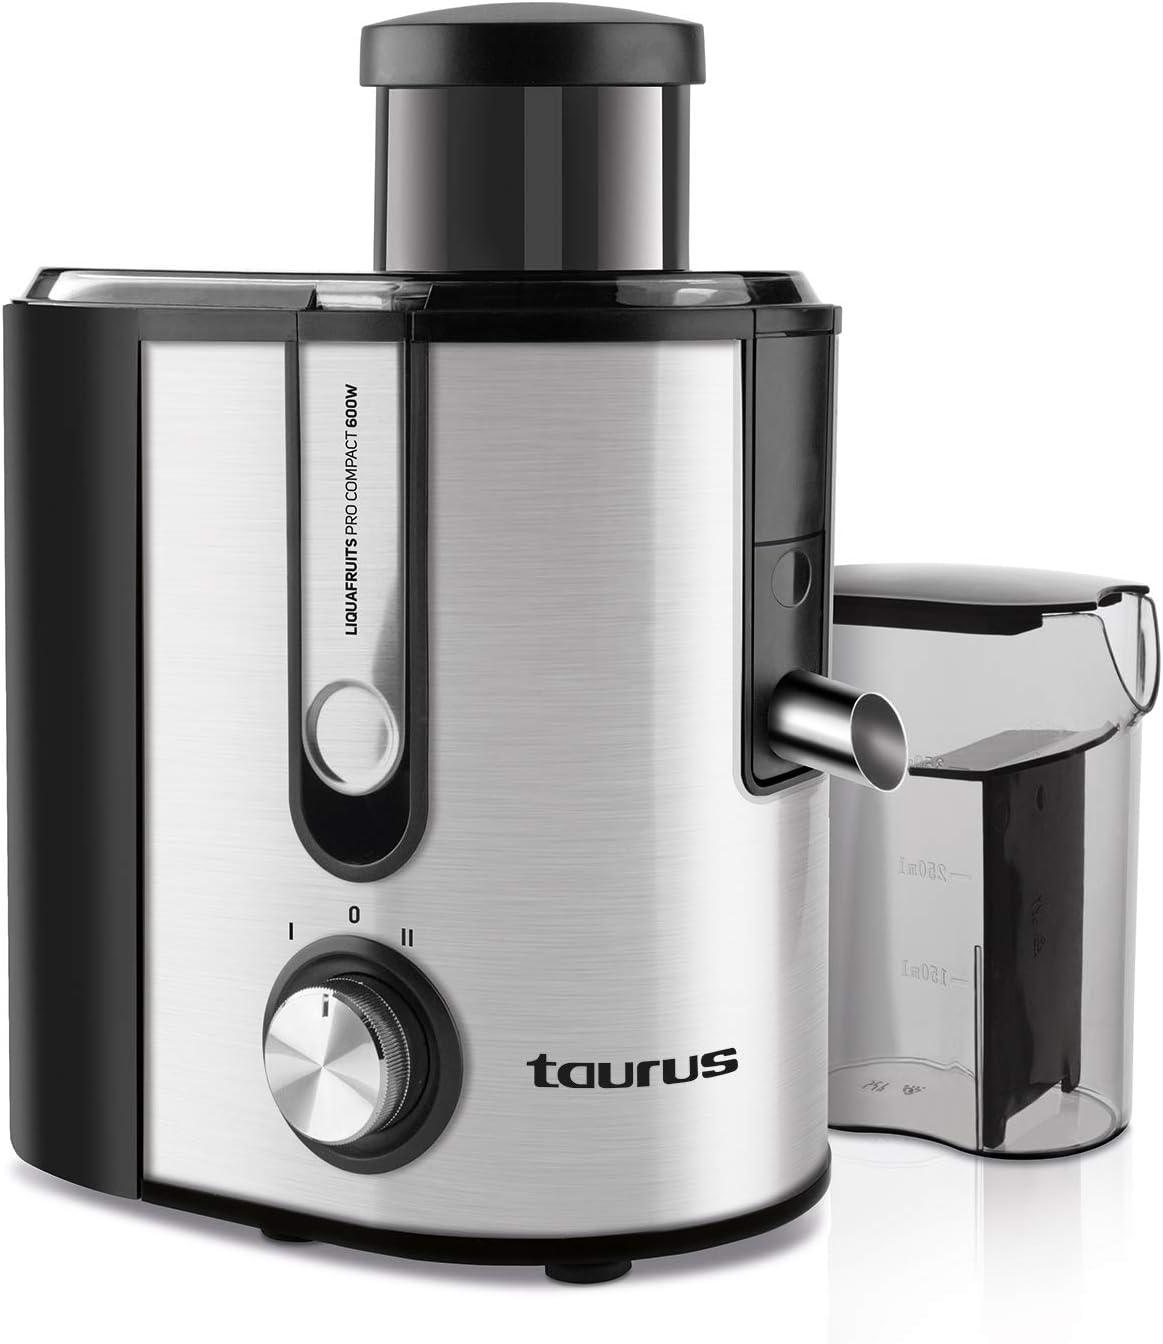 Taurus Pro Compact Licuadora centrífuga, INOX